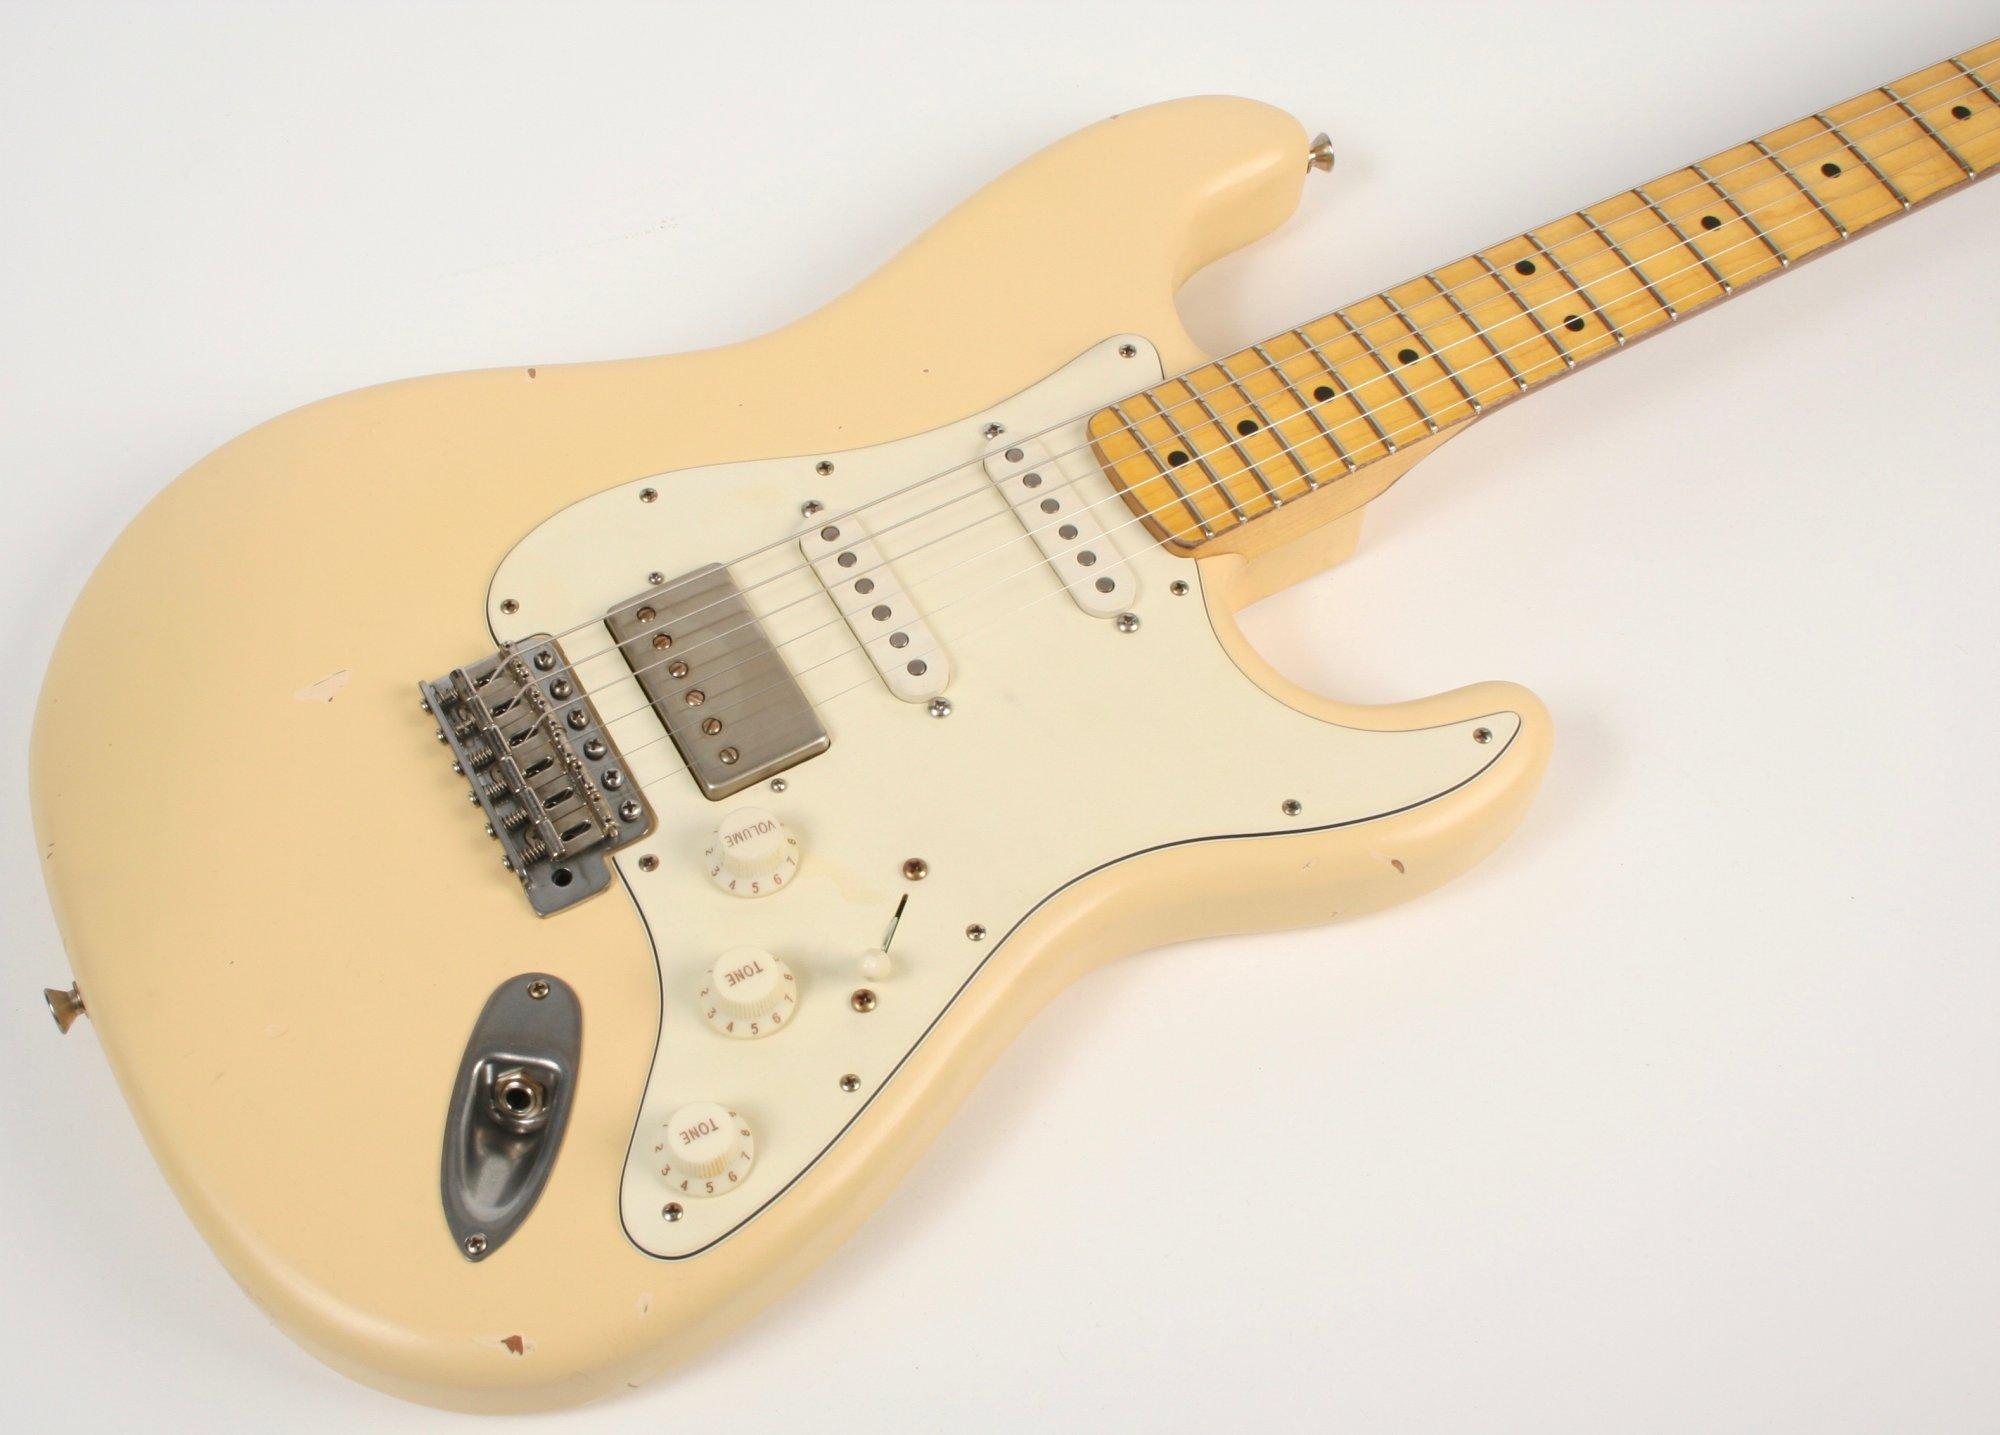 Nash Guitars S-67 HSS Vintage White Lollar Pickups